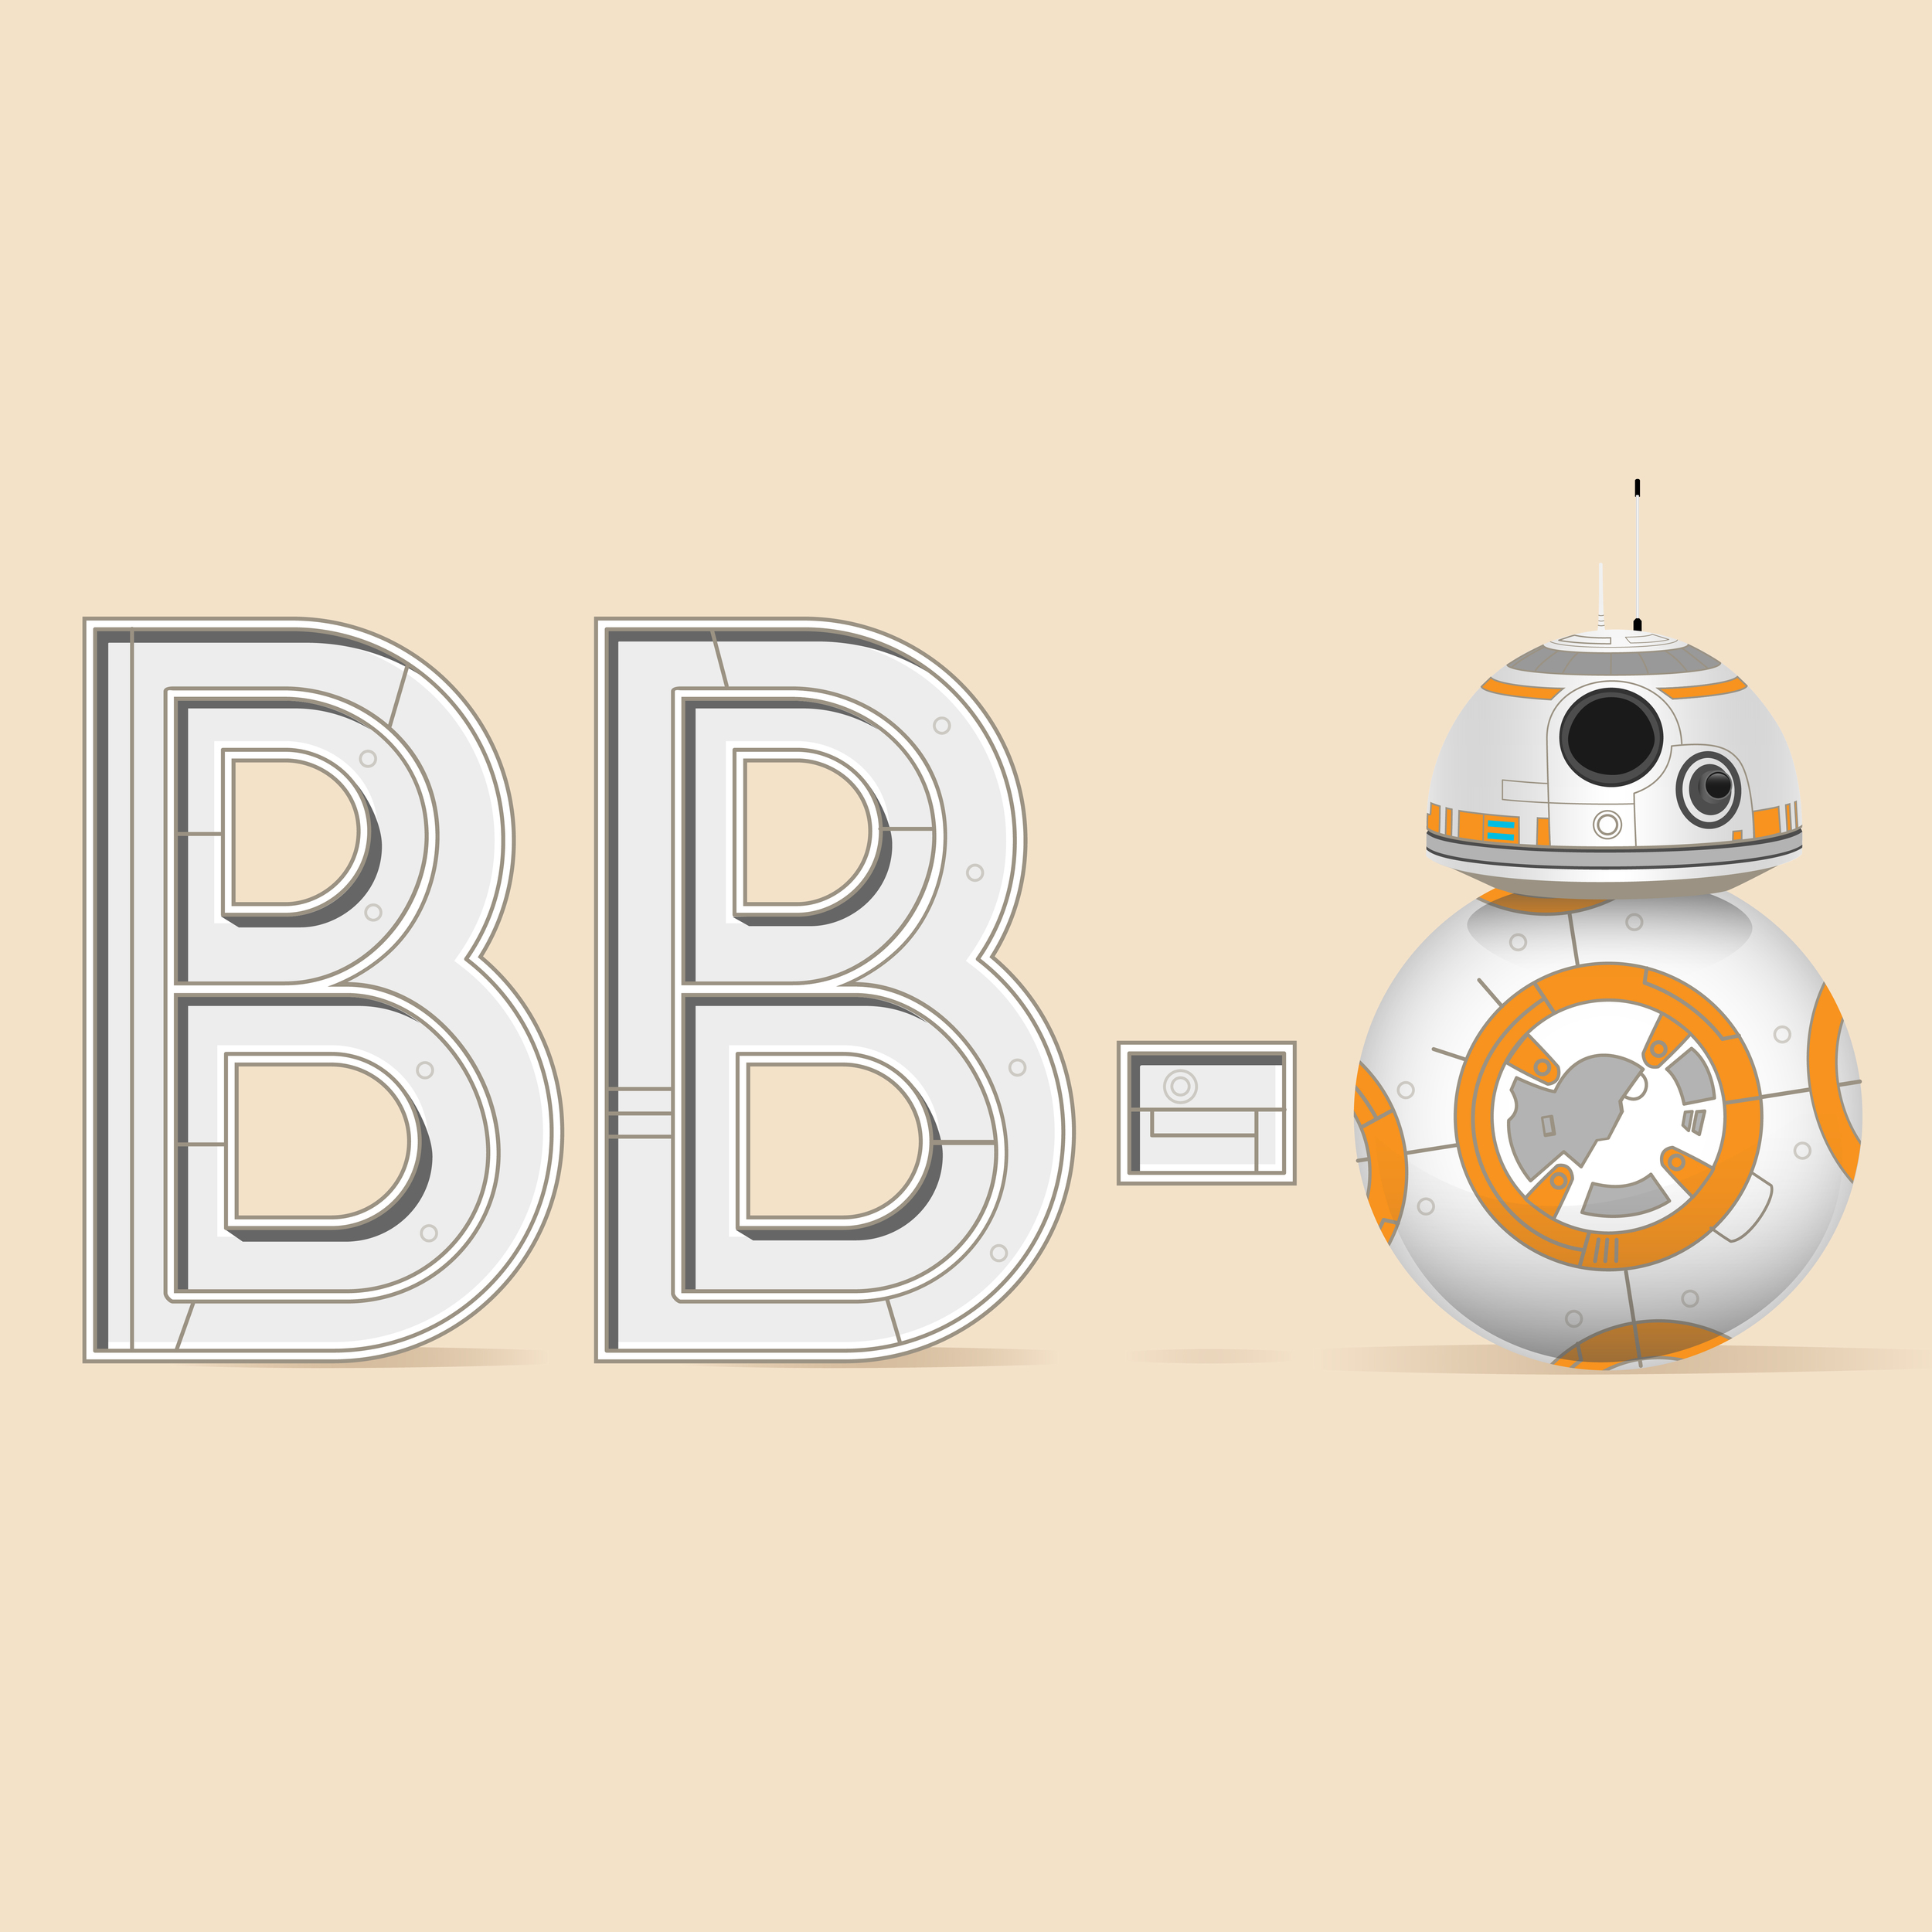 bb8-01.jpg